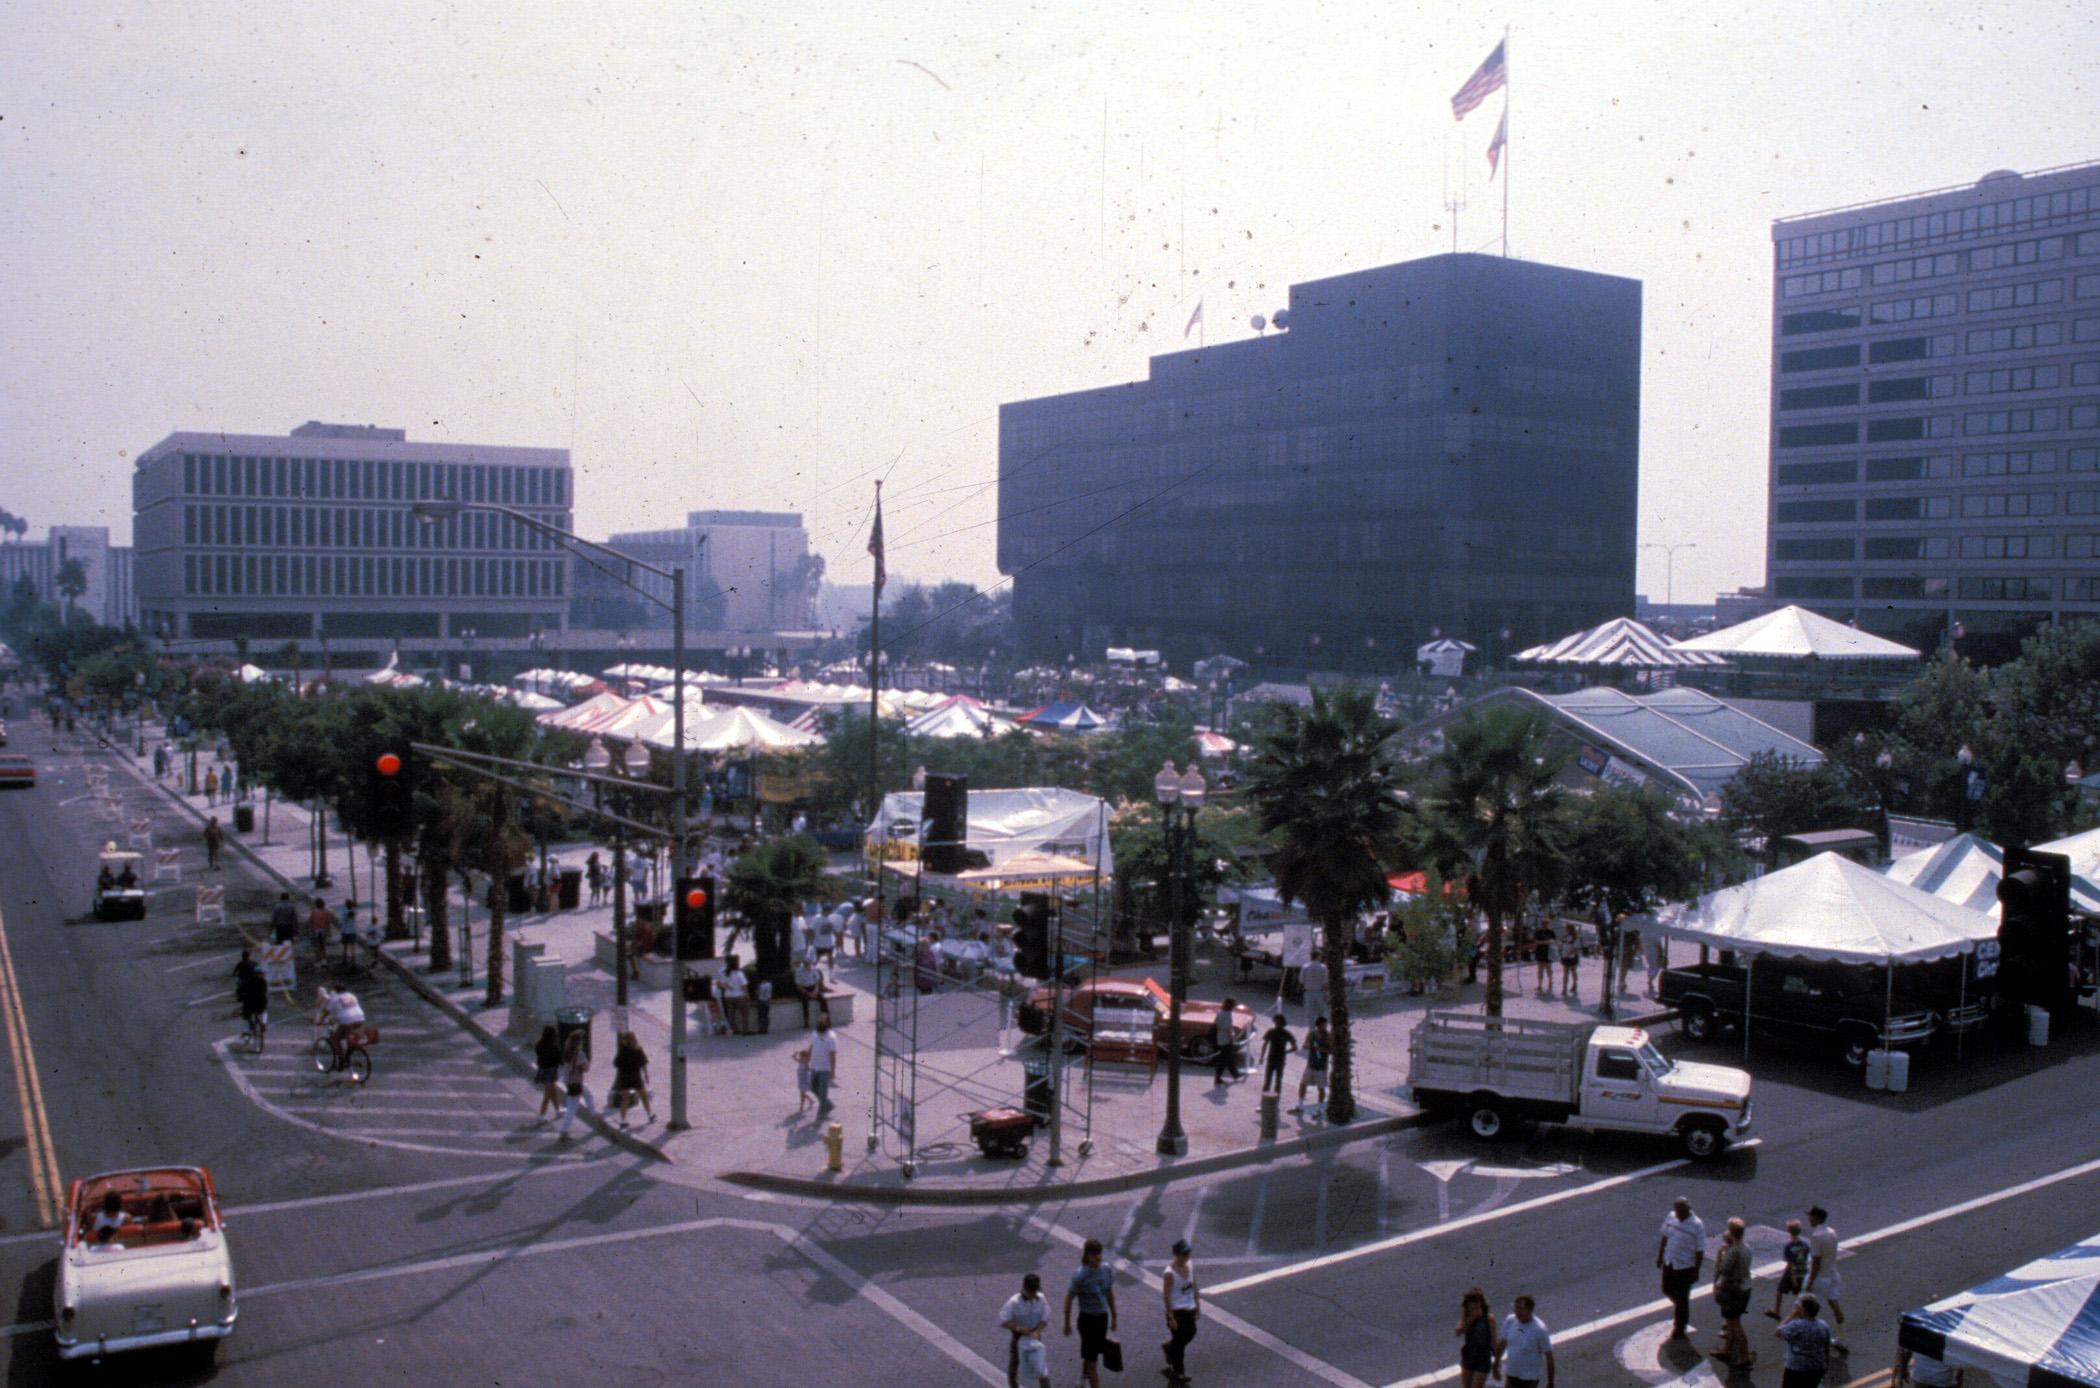 Court Street Community Square